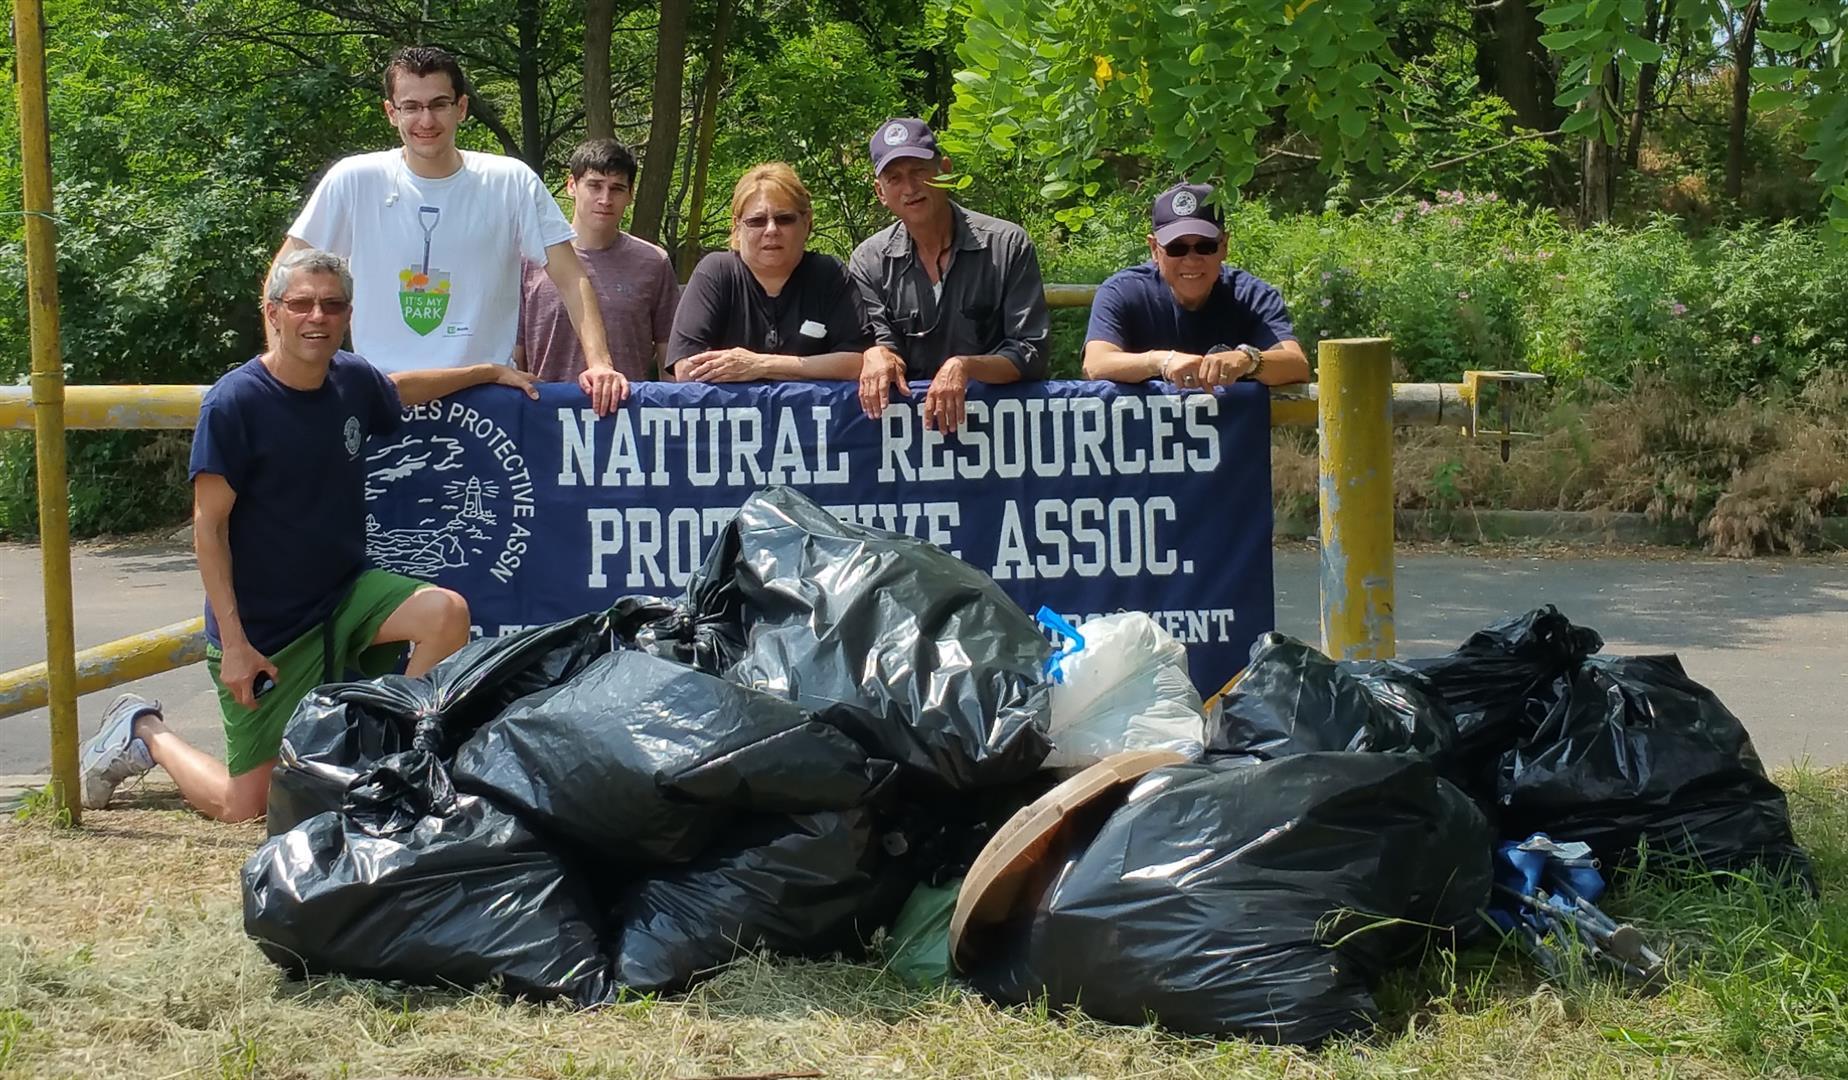 NRPA beach cleanup 160611 01